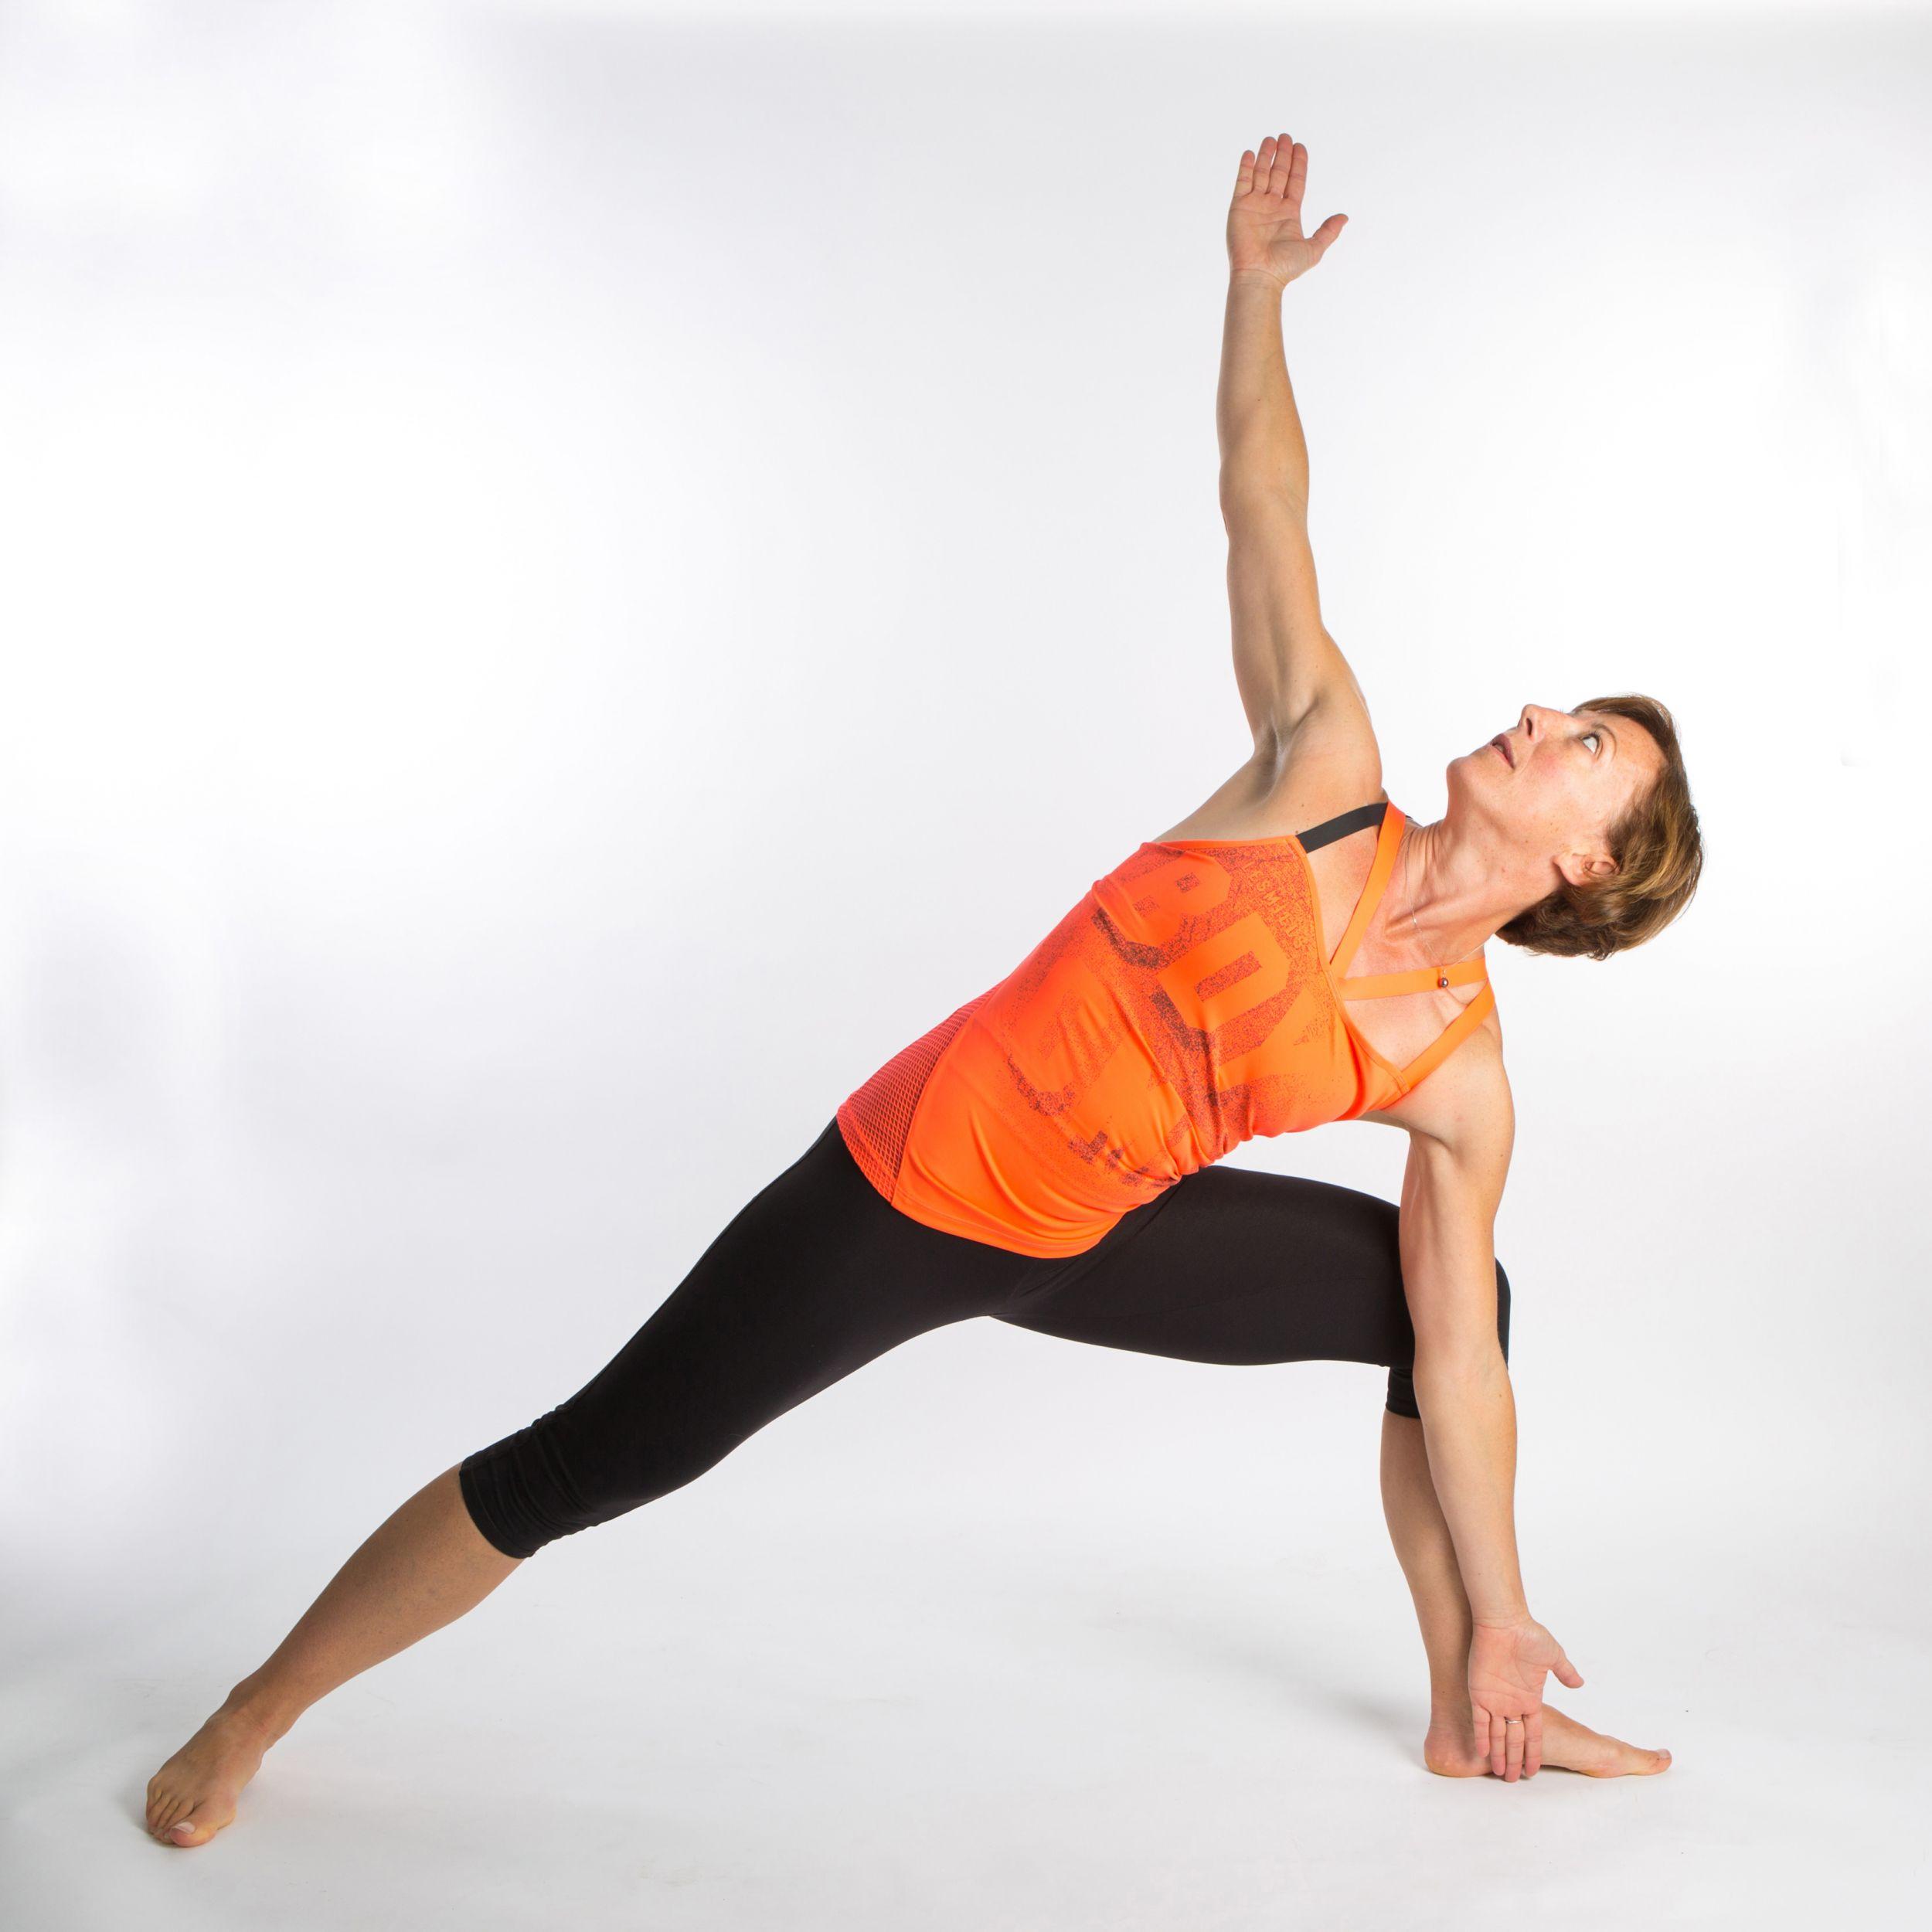 Abonnement 1 an Fitness, Pilates, Dance image 3